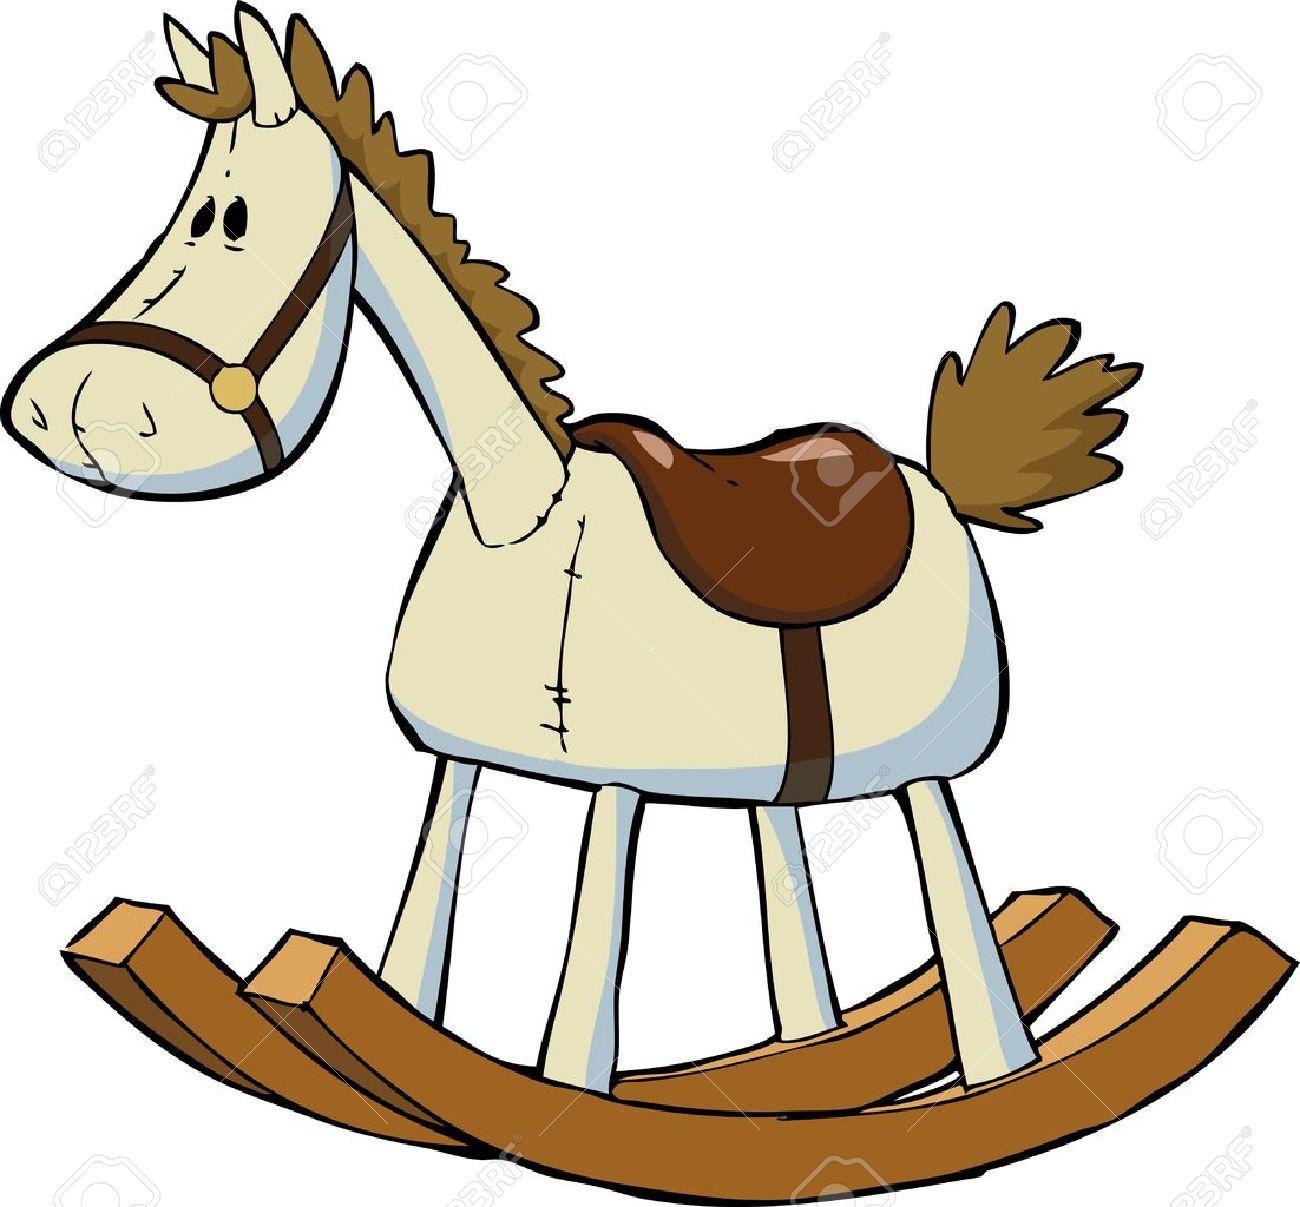 1300x1207 Strikingly Rocking Horse Clip Art 4 270 Stock Illustrations